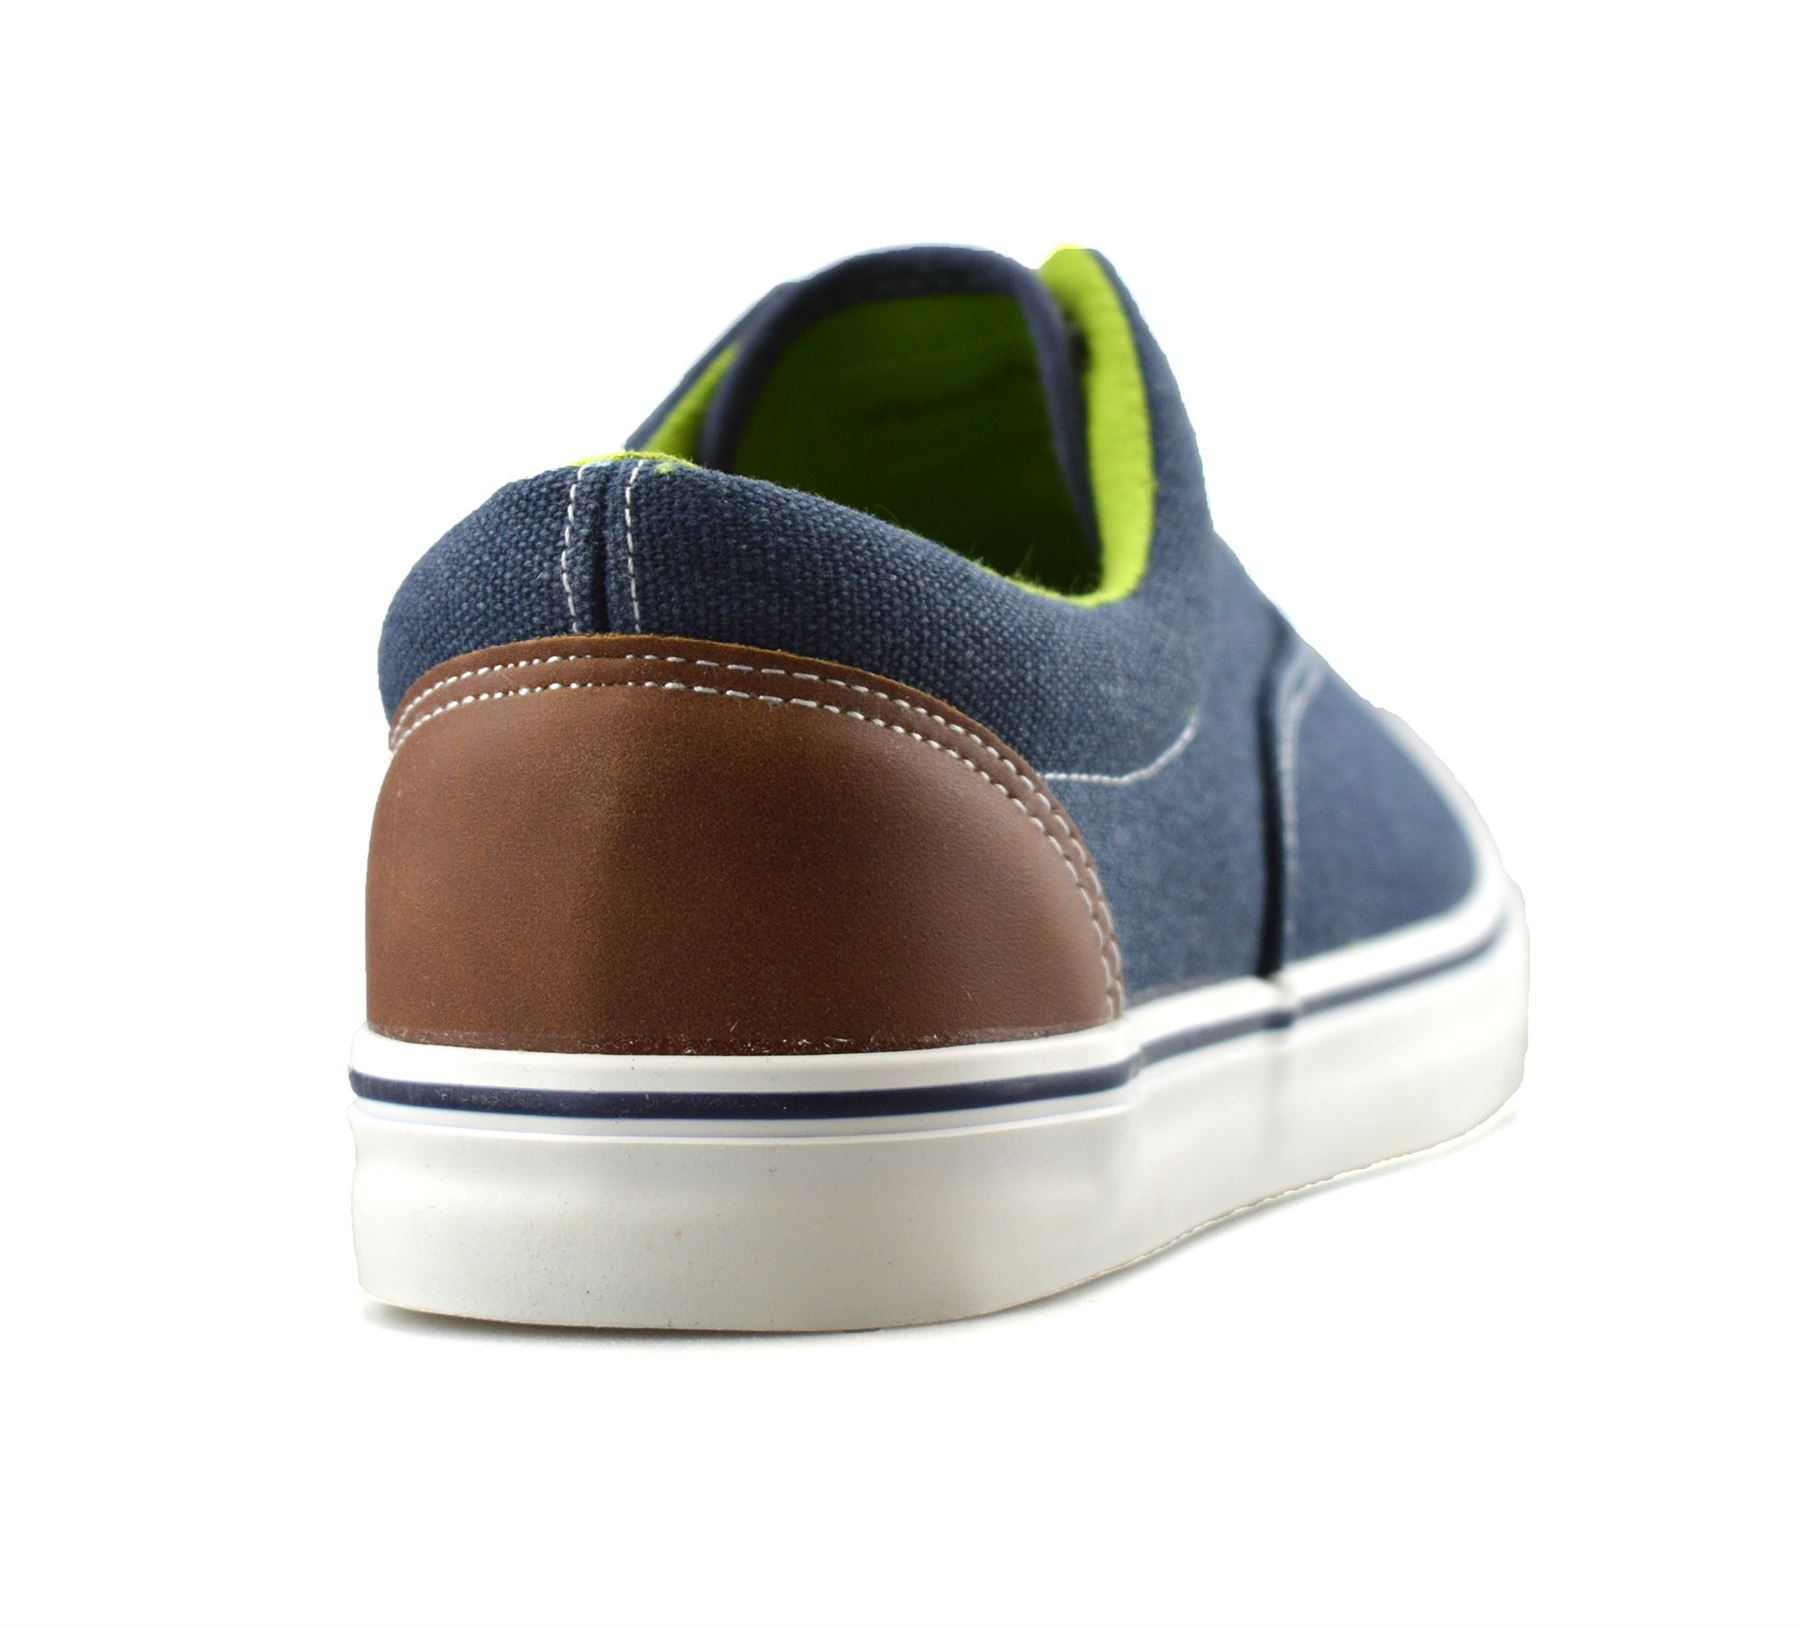 Mens-Casual-Flat-Lace-Up-Canvas-Skate-Pumps-Walking-Plimsolls-Trainers-Shoe-Size thumbnail 14